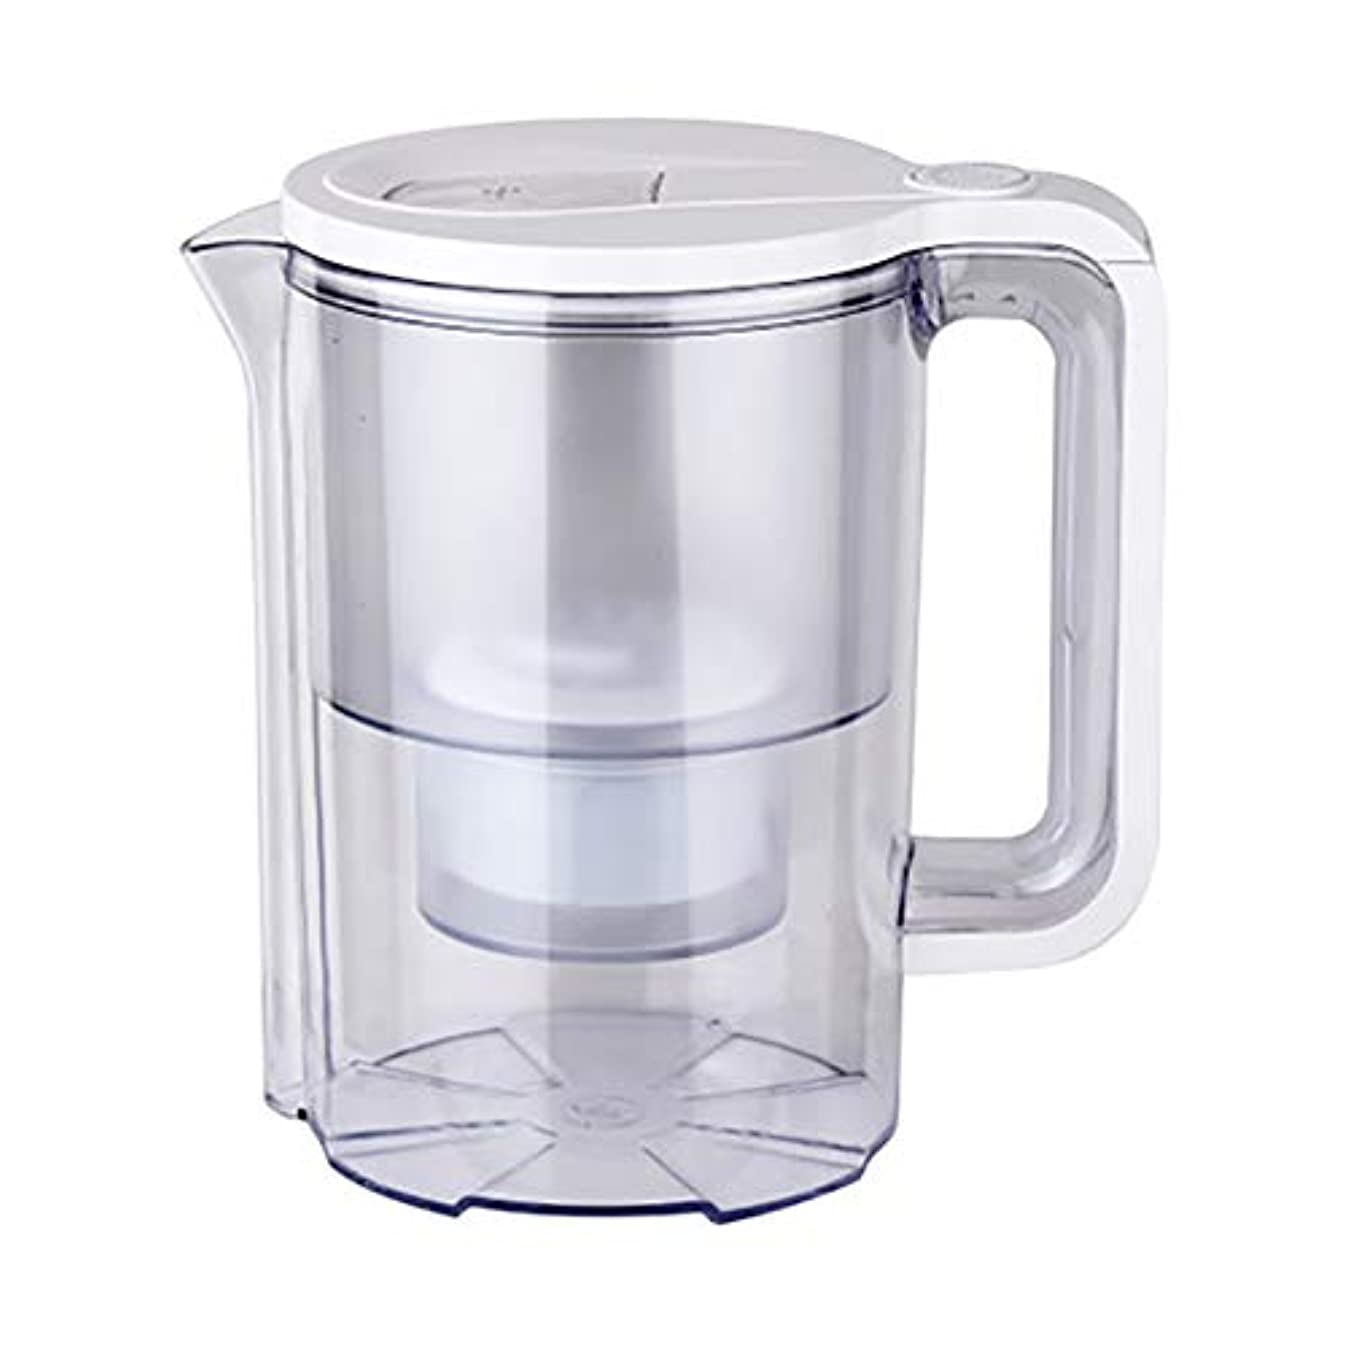 MYD888 Water Filter Pitcher Water Filter Jugs Net Kettle Household Water Purifier Drinking Water Filter Filter Kettle Large Capacity Water Cup